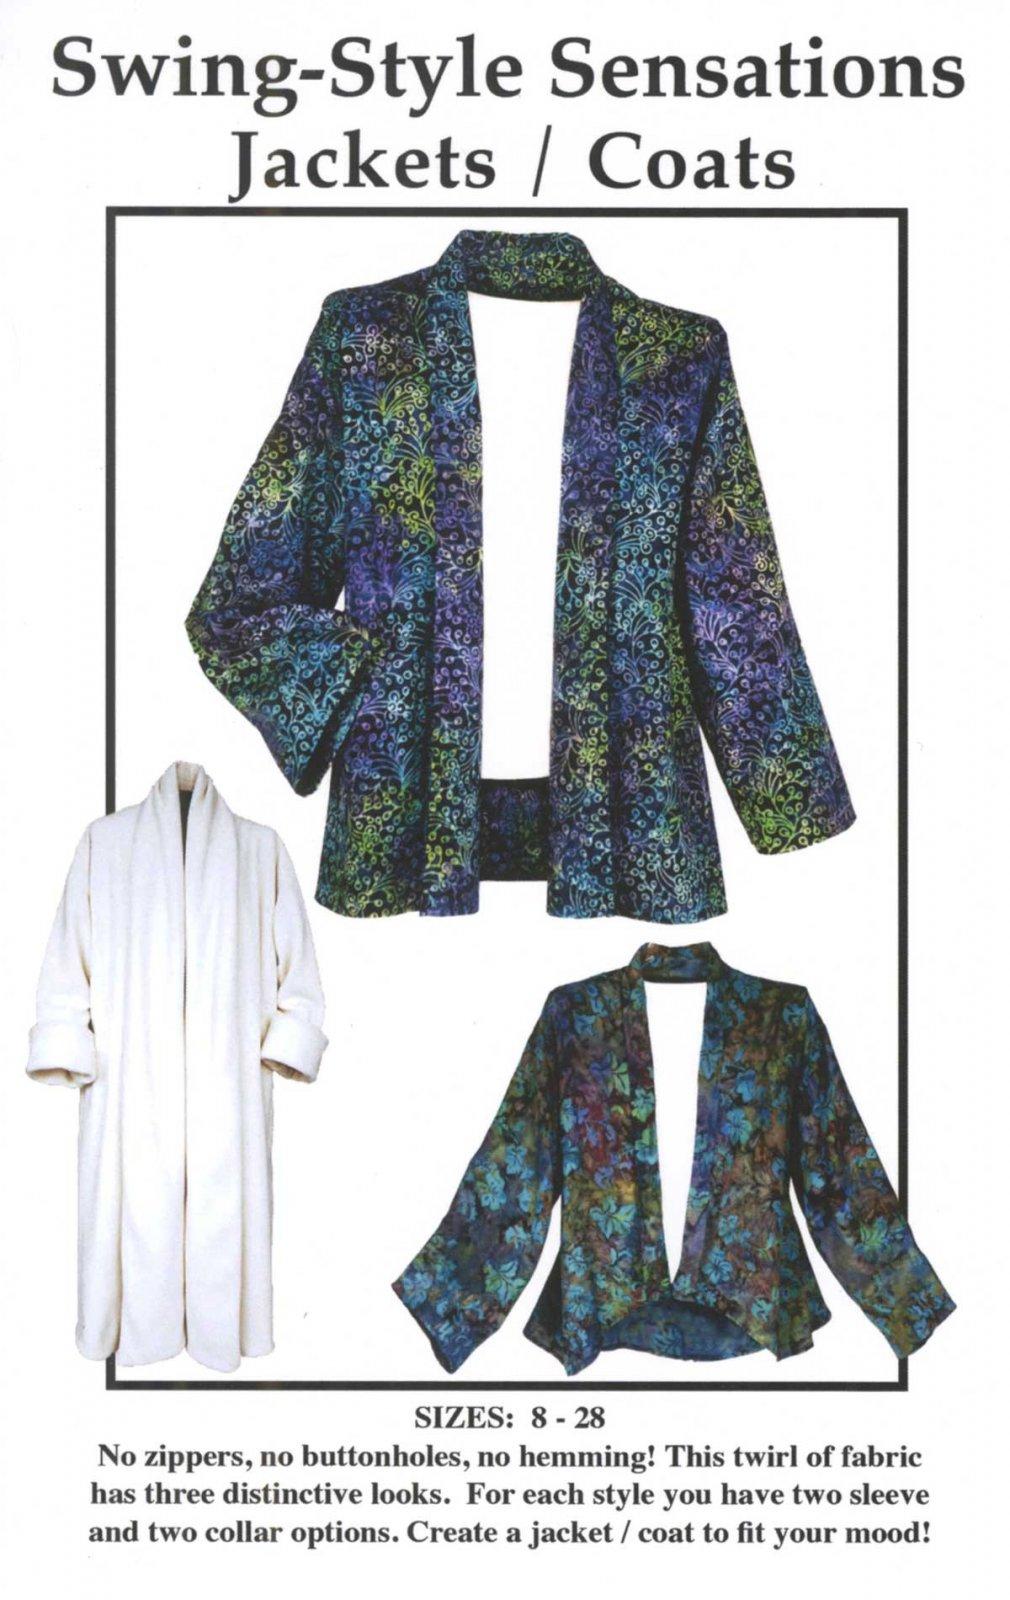 Swing-Style Sensations Jacket / Coat